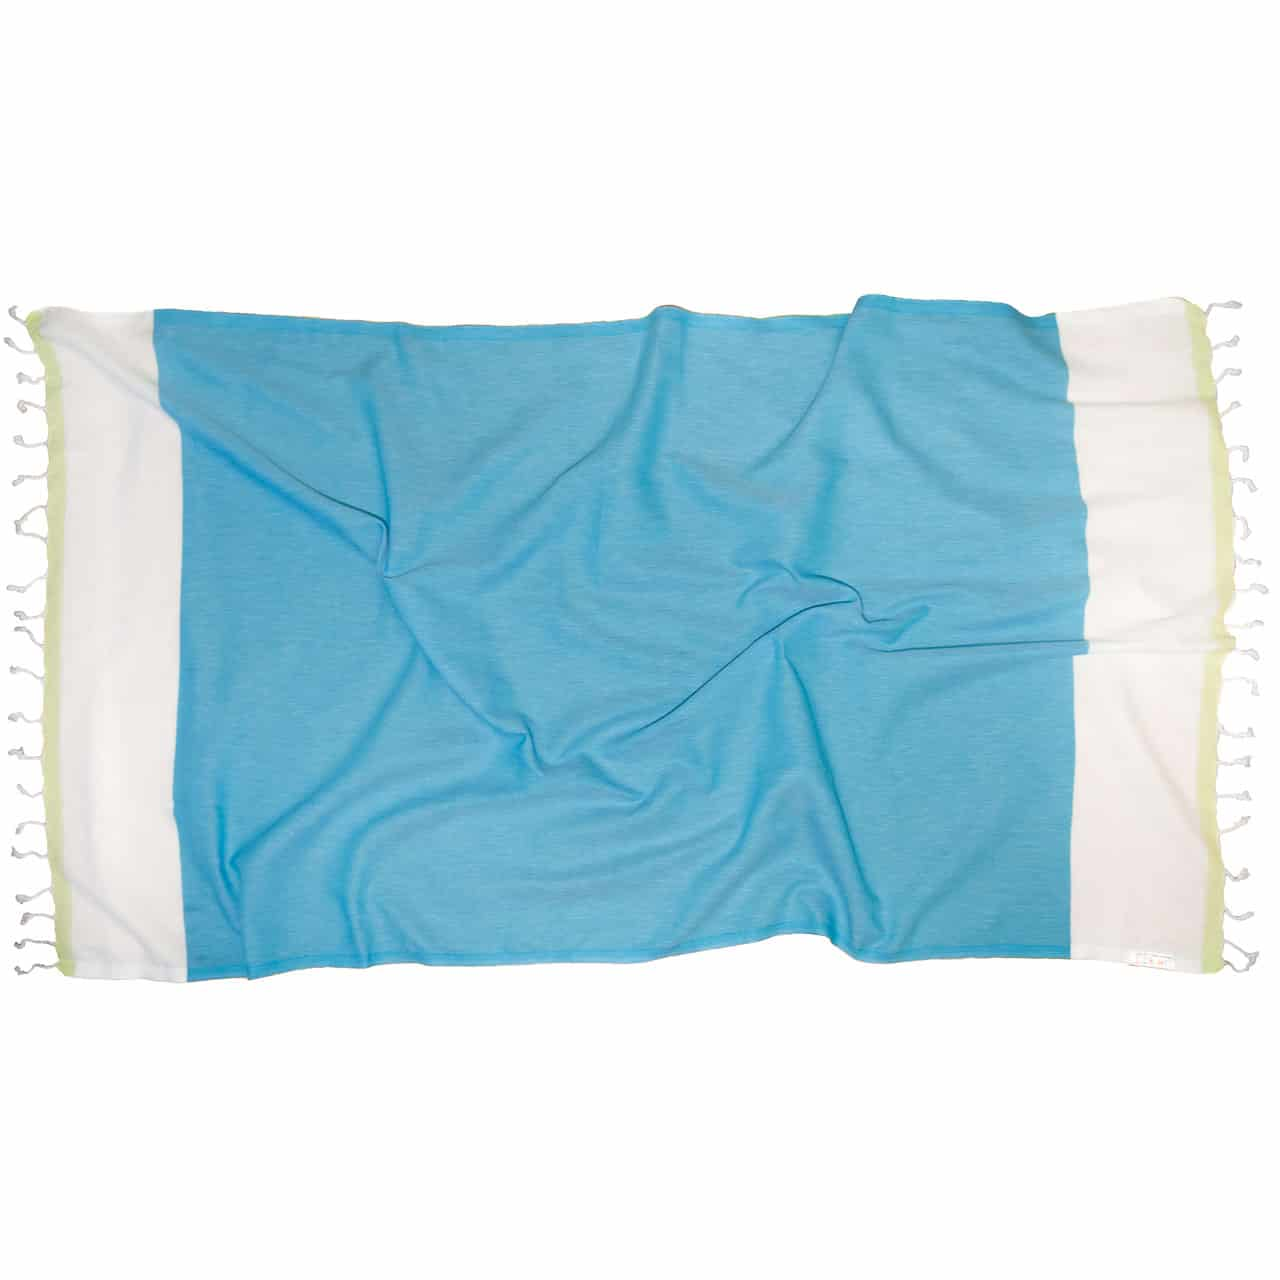 синя хавлия BLUEBERRY Lemonical Towel